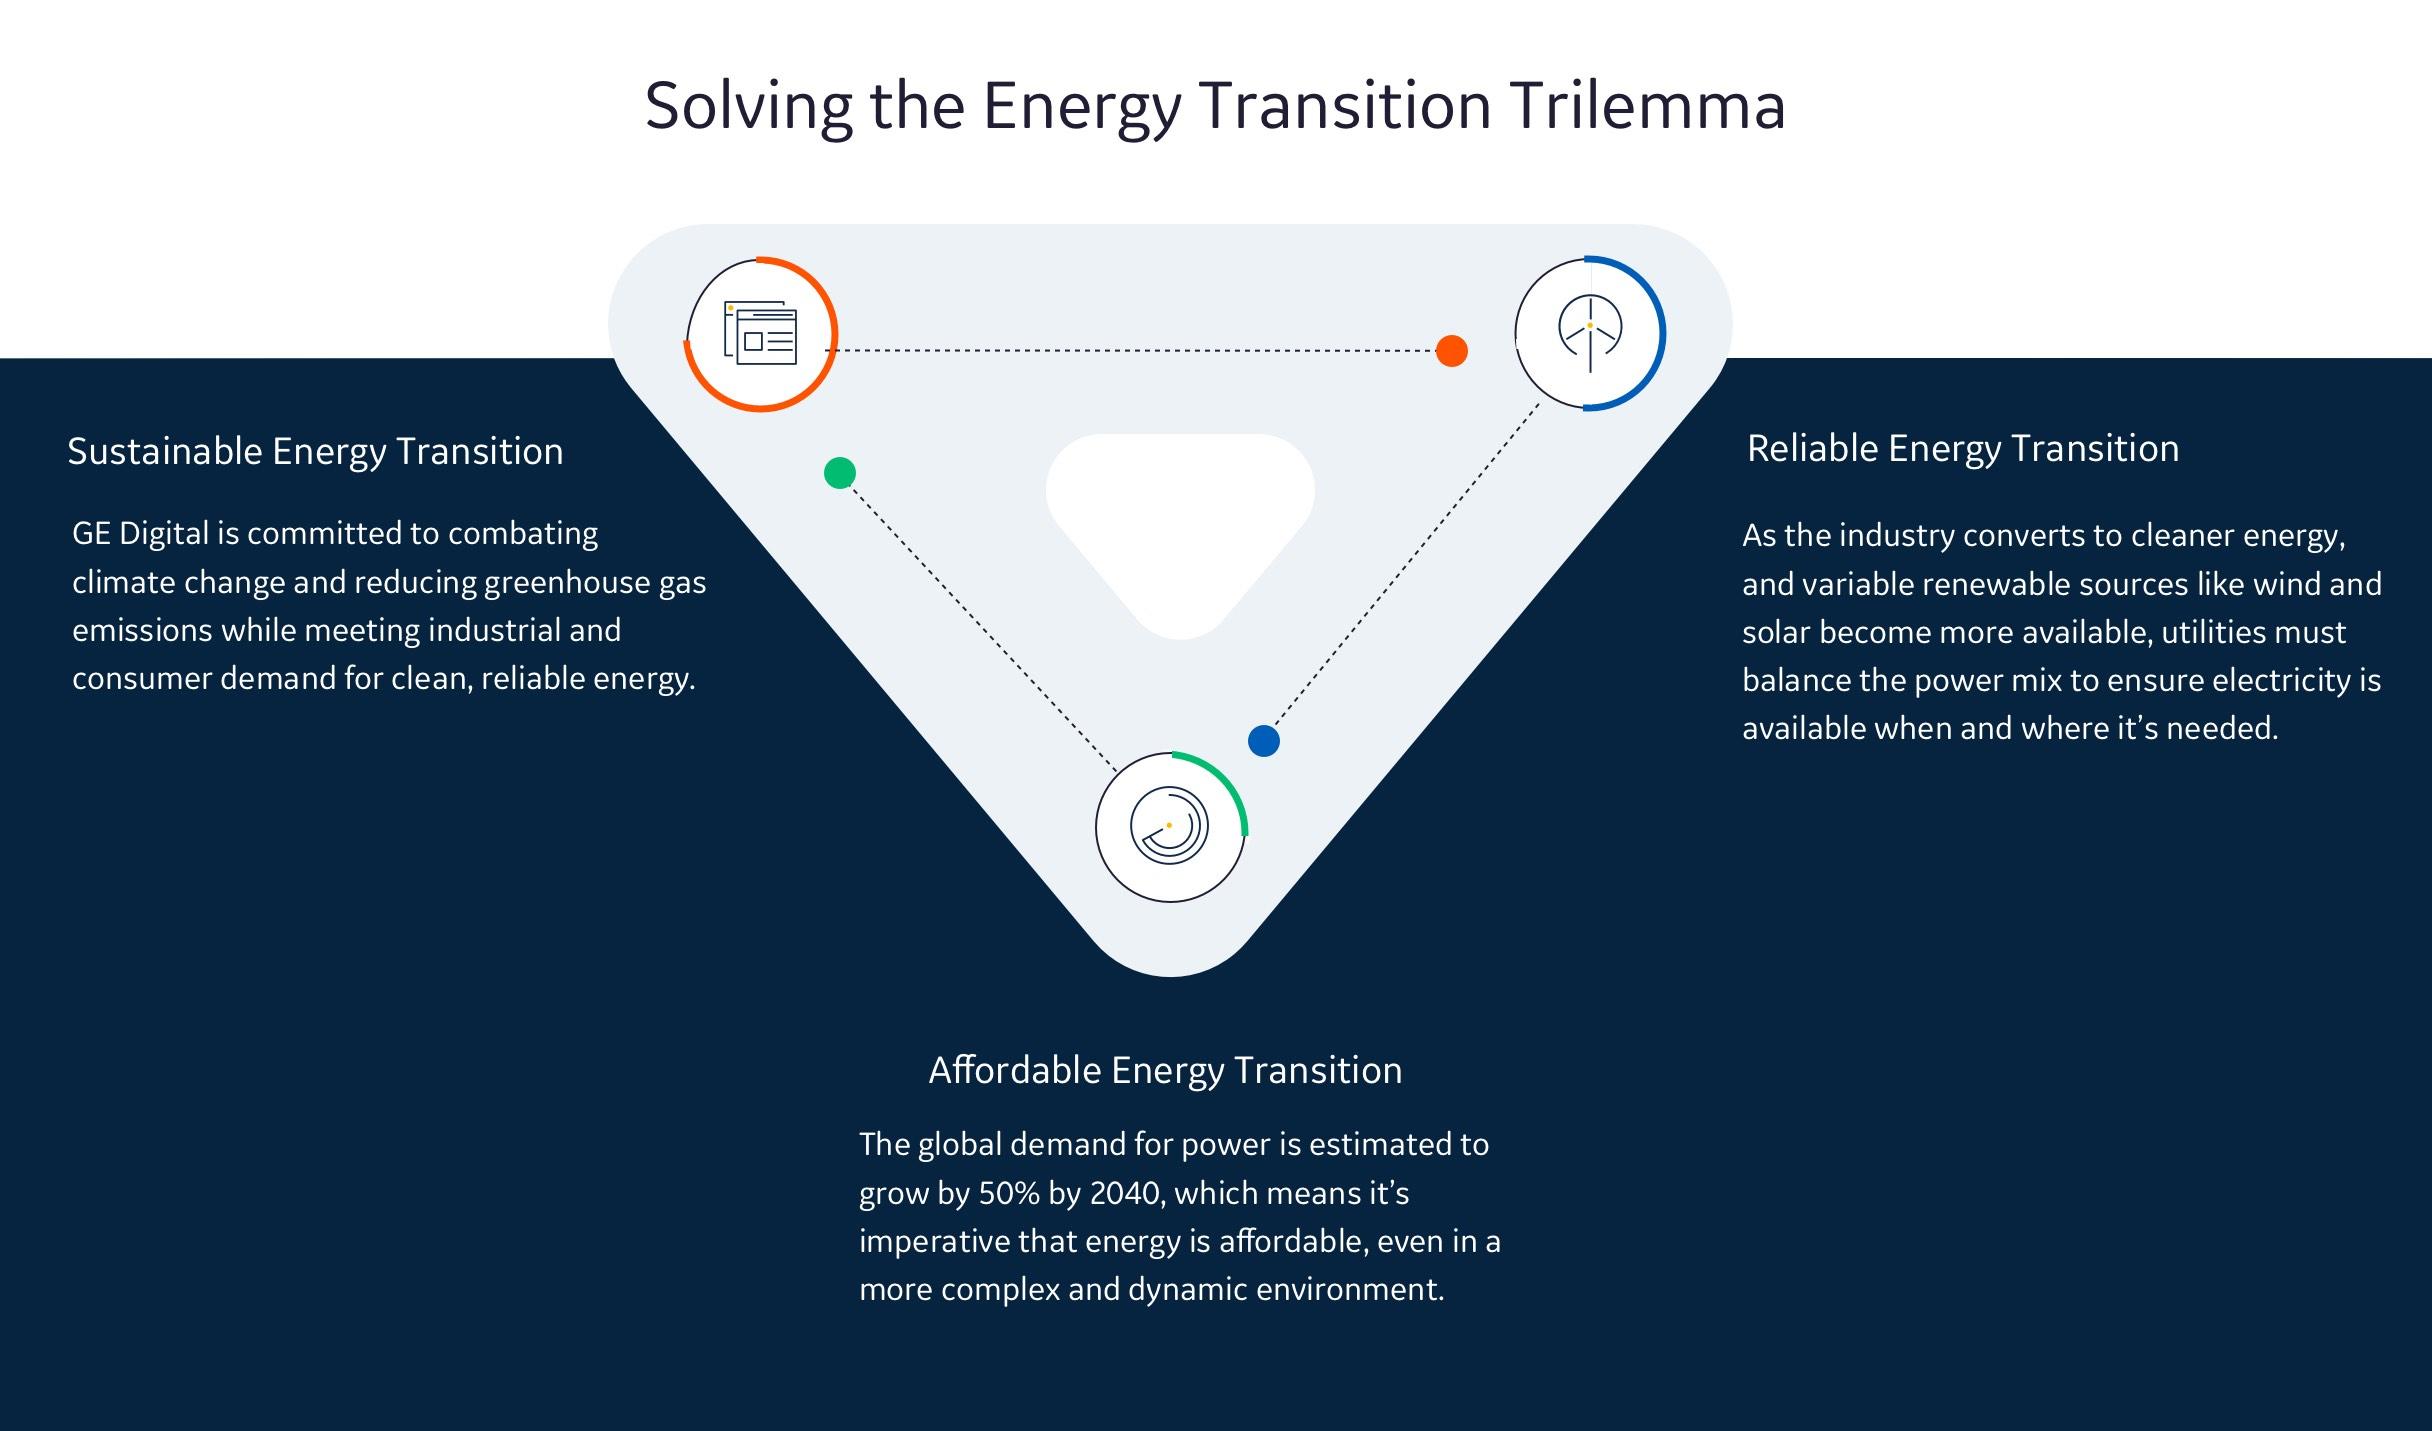 Future of energy | GE Digital | Energy transition